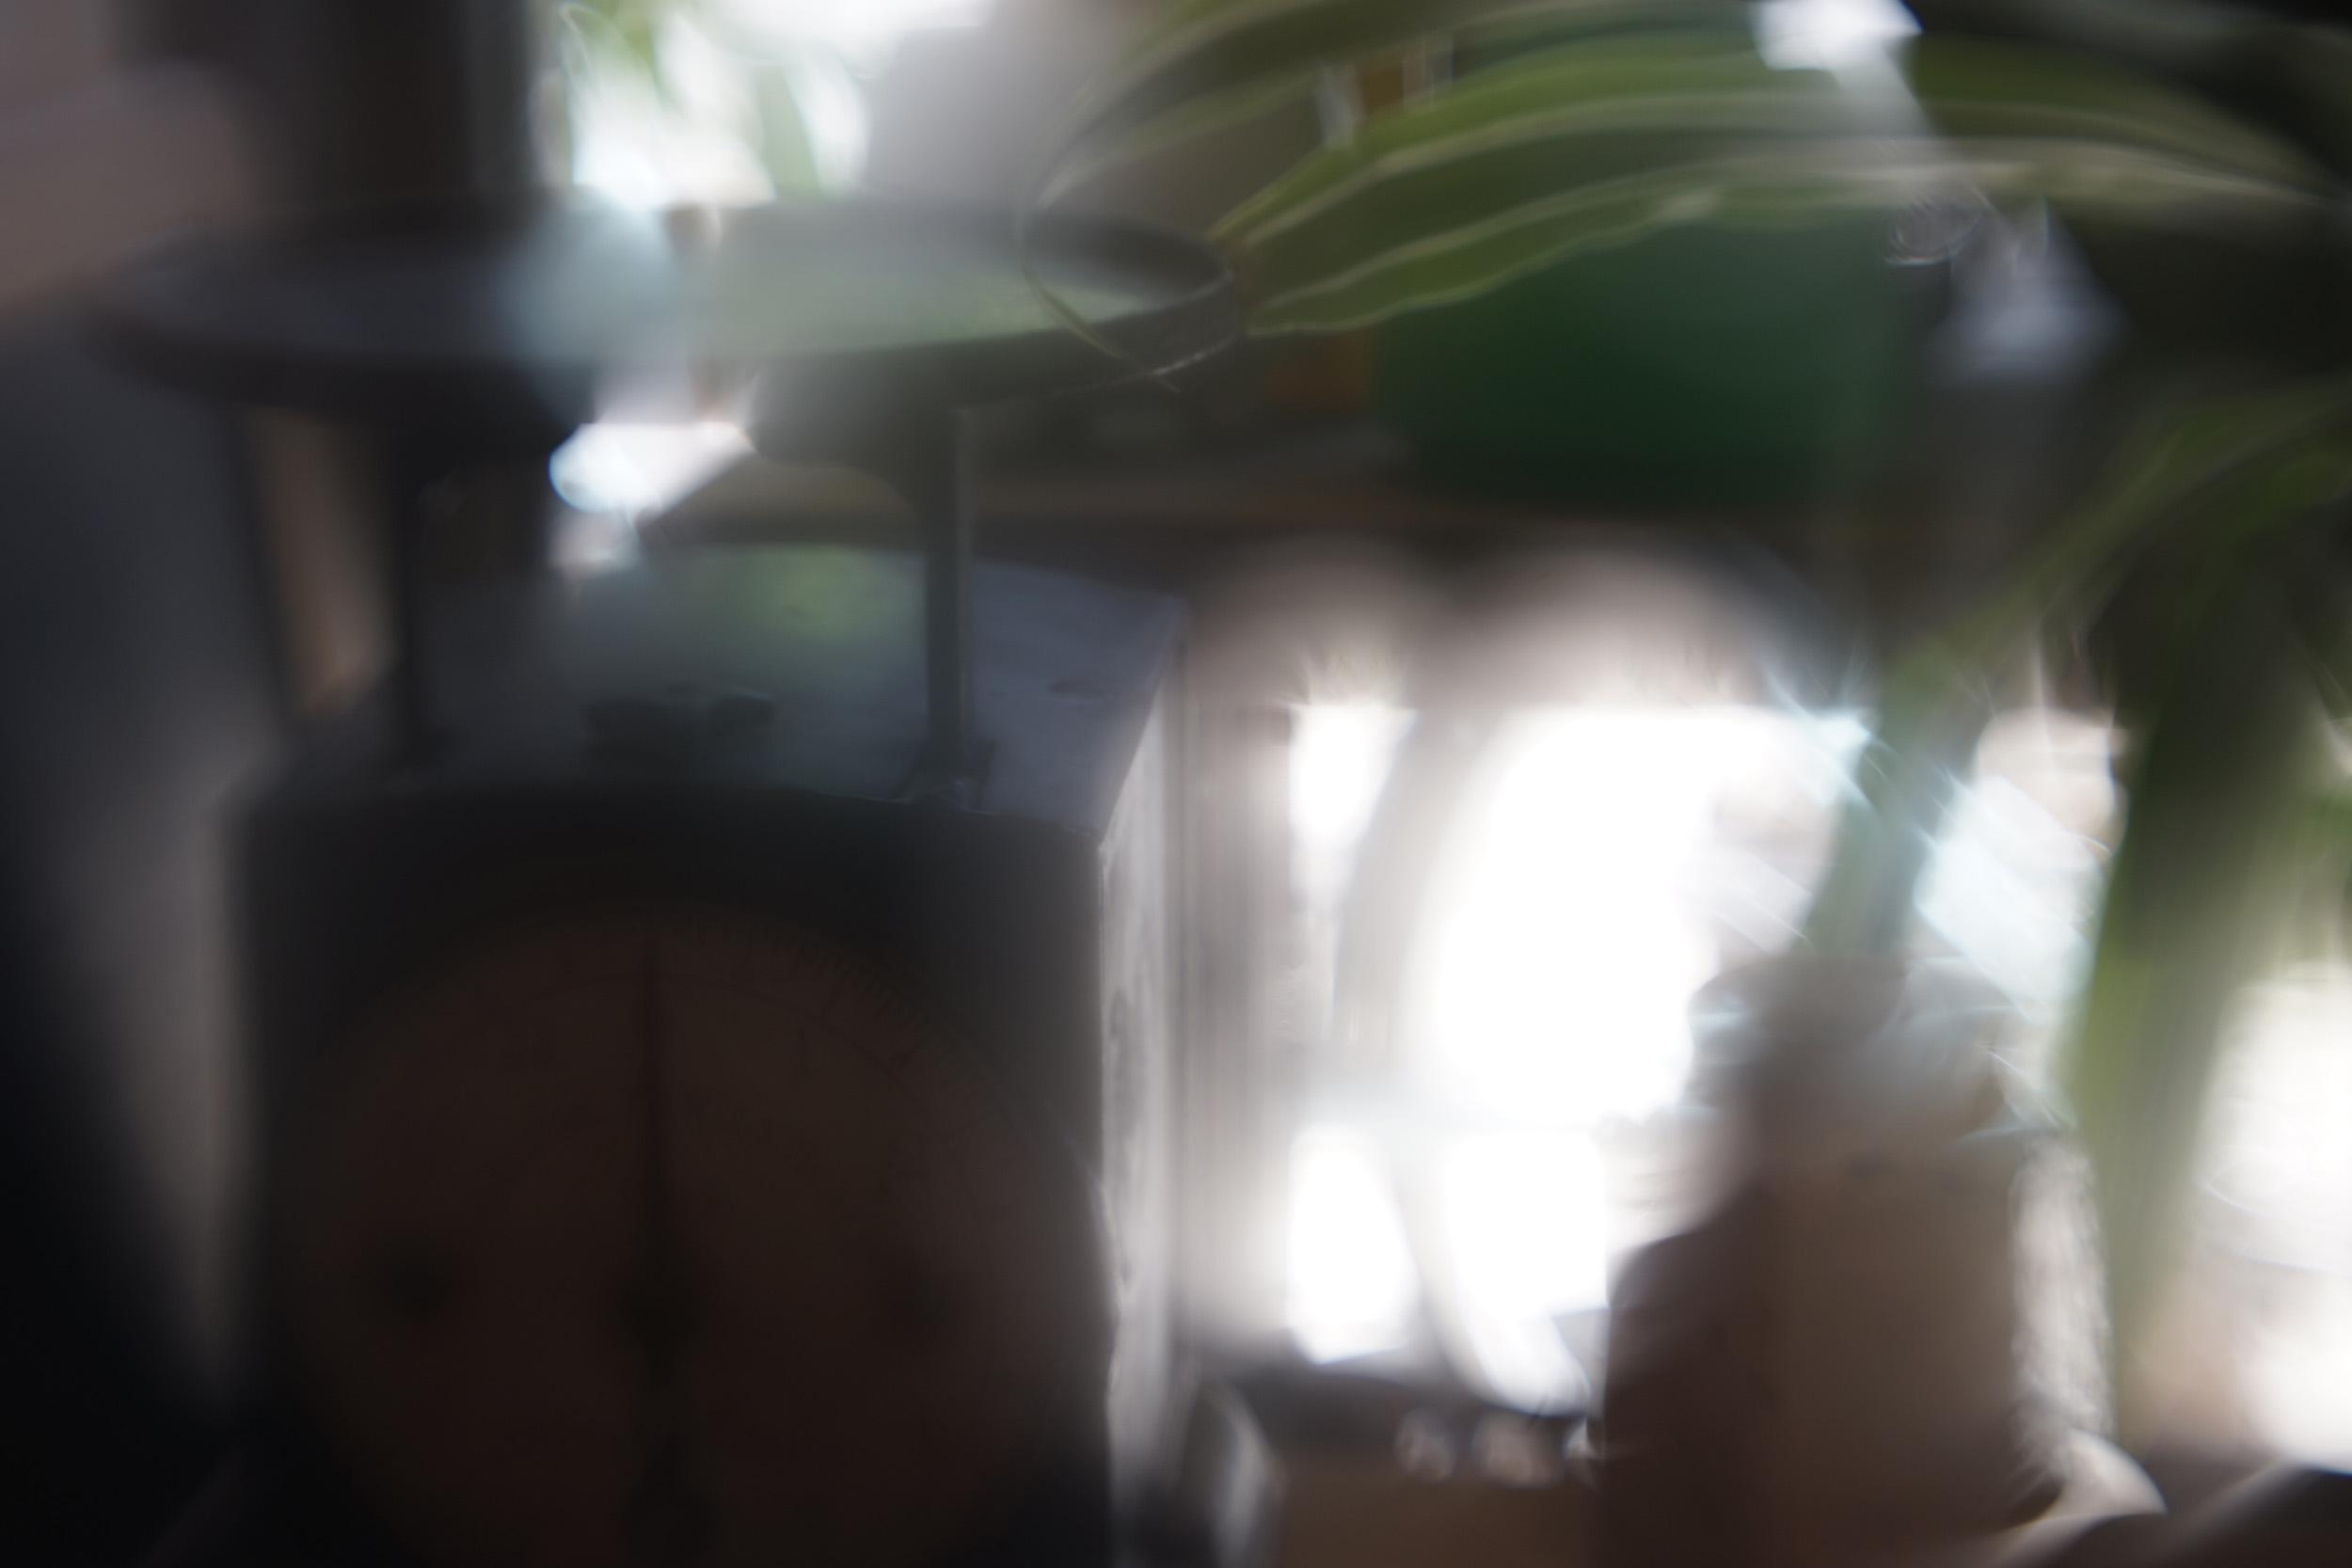 013695_17_unknown_petzval_75mm